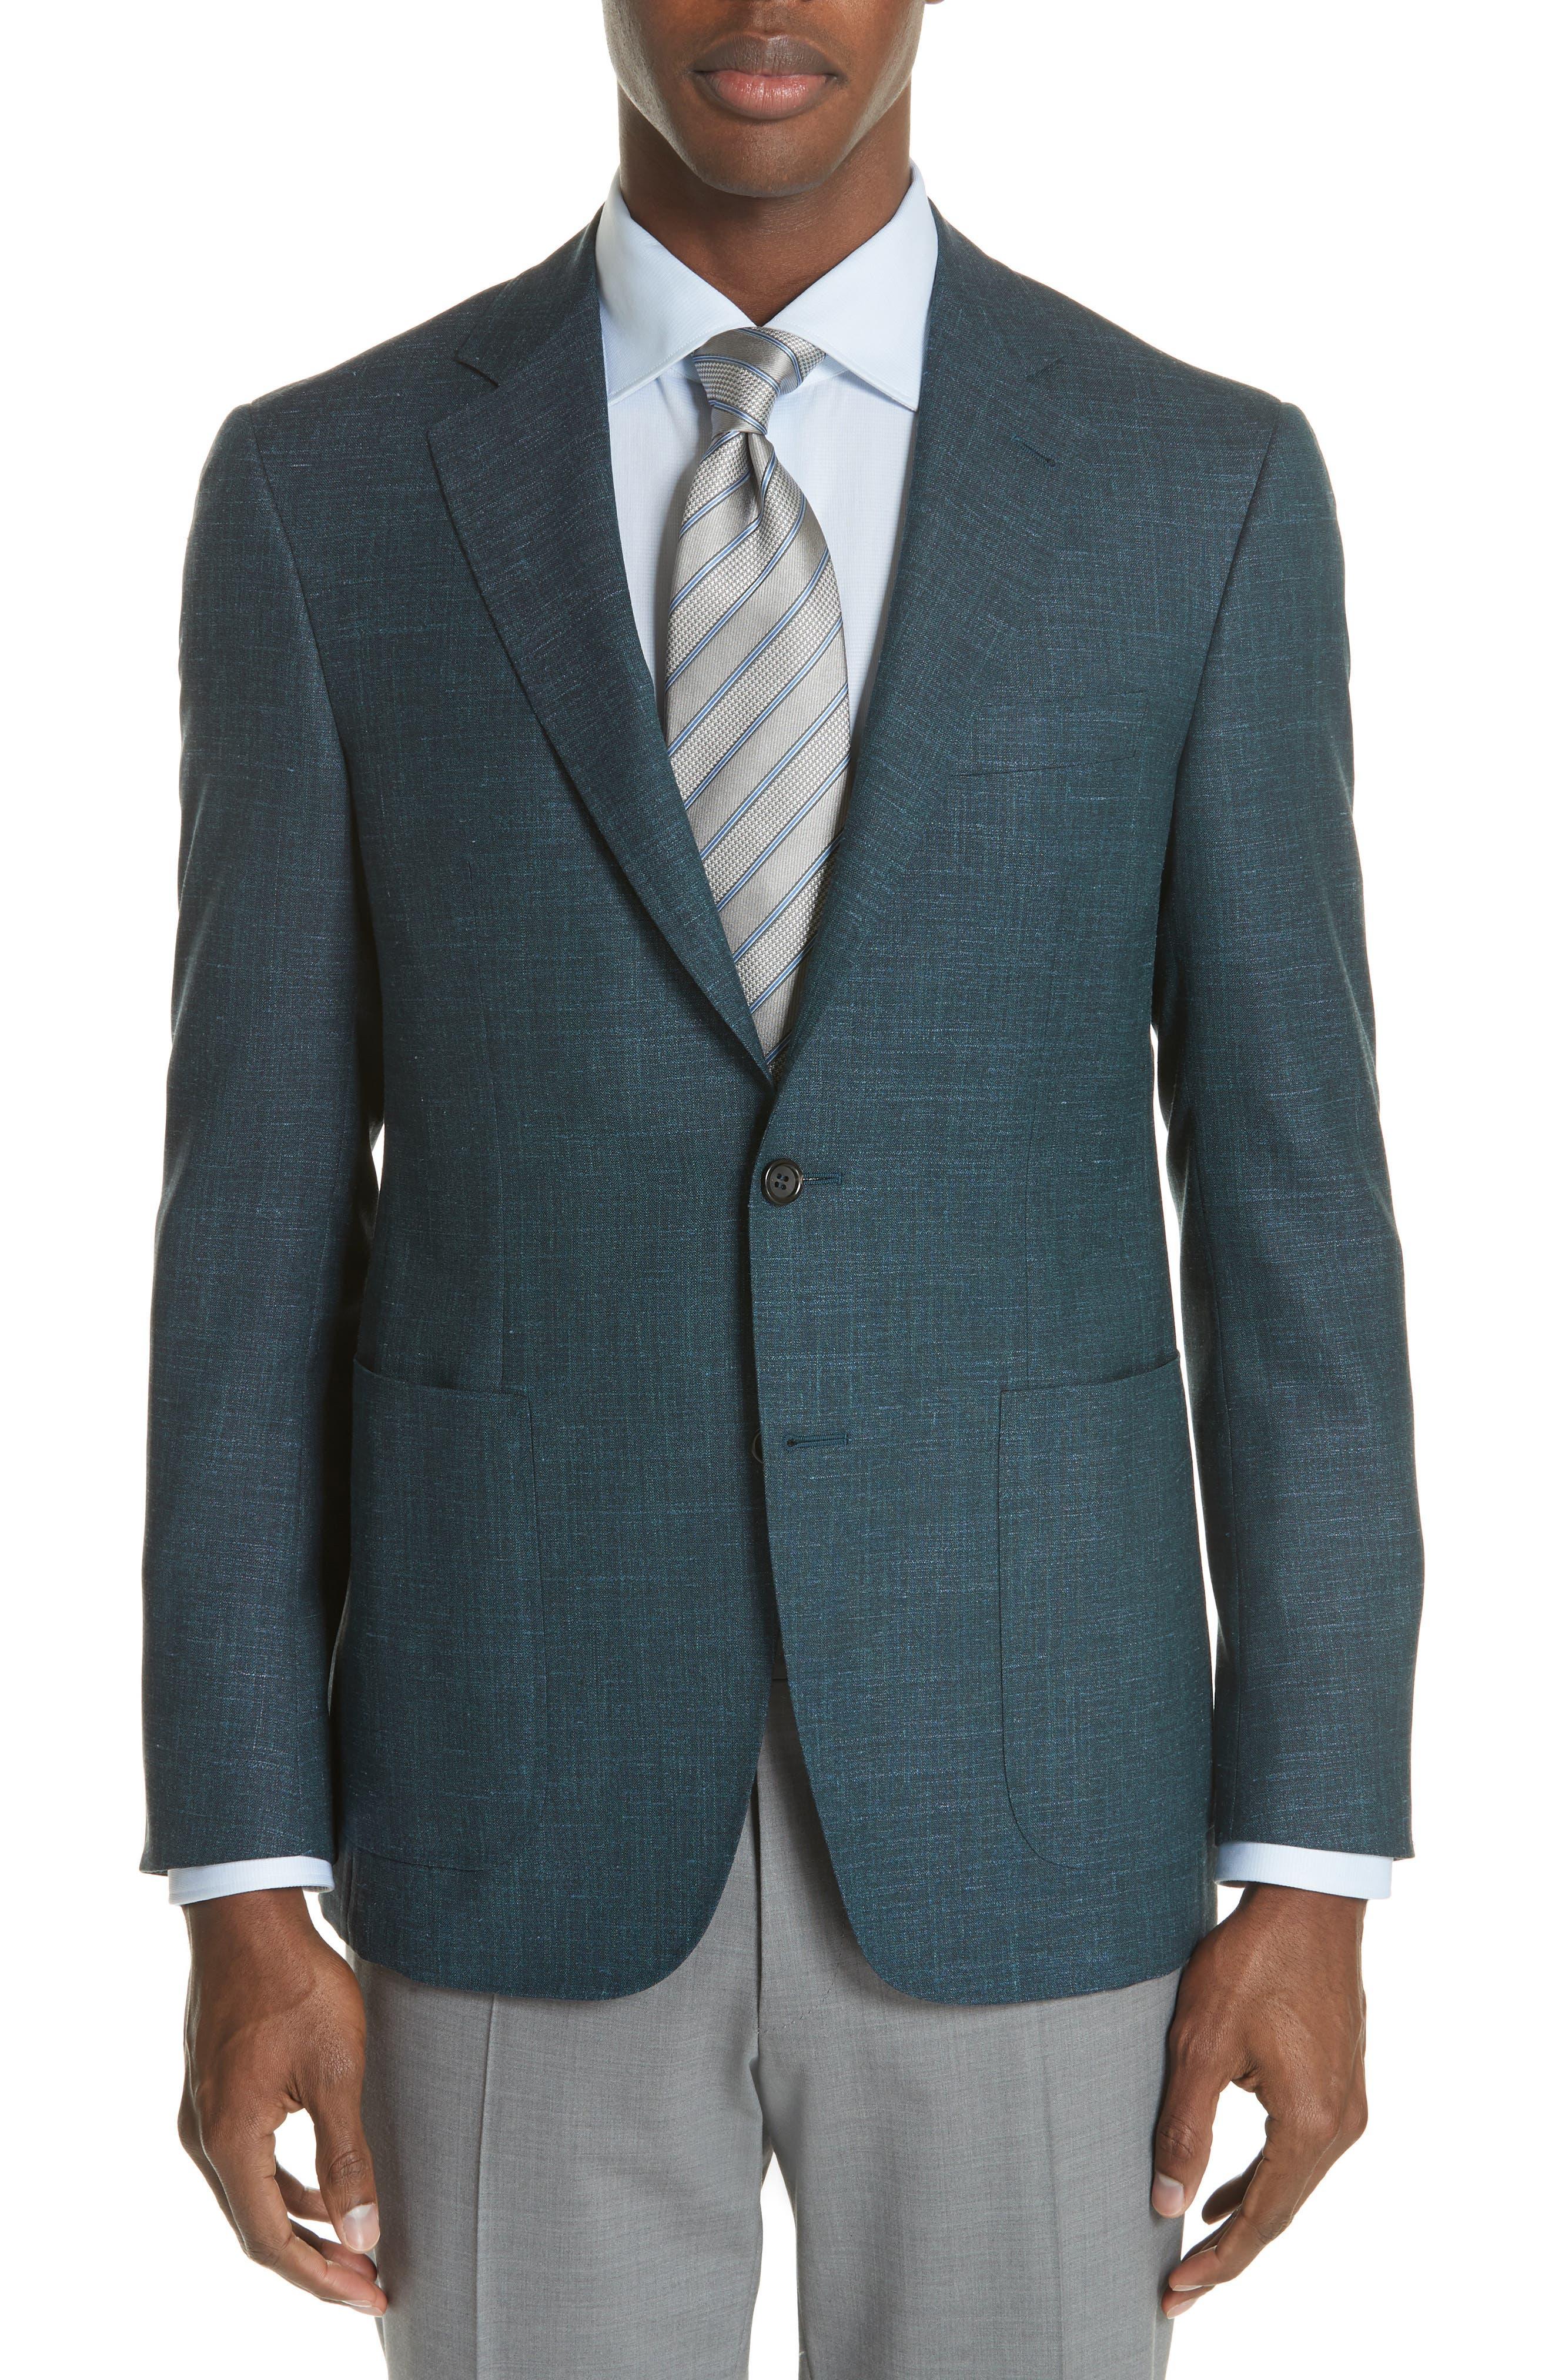 Classic Fit Wool Blend Blazer,                             Main thumbnail 1, color,                             Green